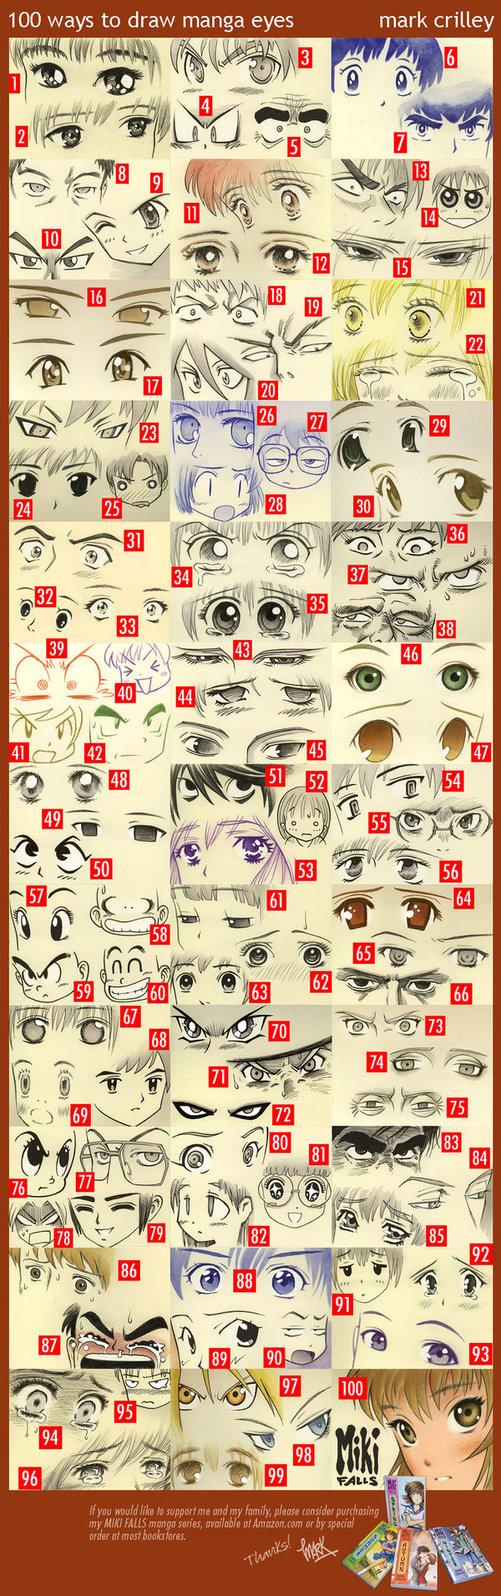 Como Dibujar Anime Tutorial Para Anime Cuerpo Youtube - apexwallpapers ...